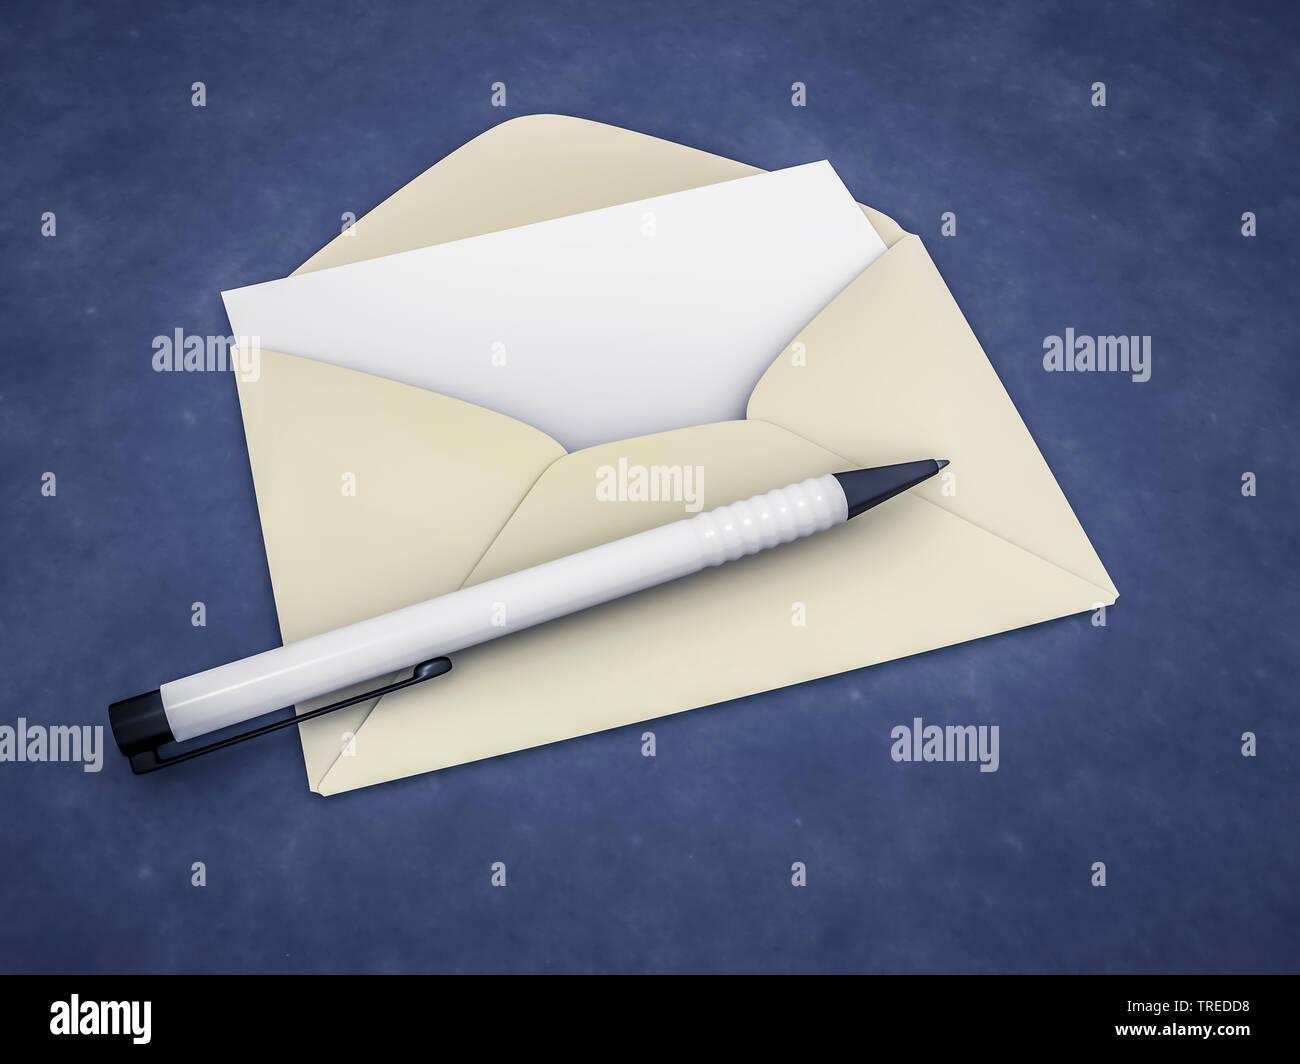 lian gong mi jue secret methods of acquiring